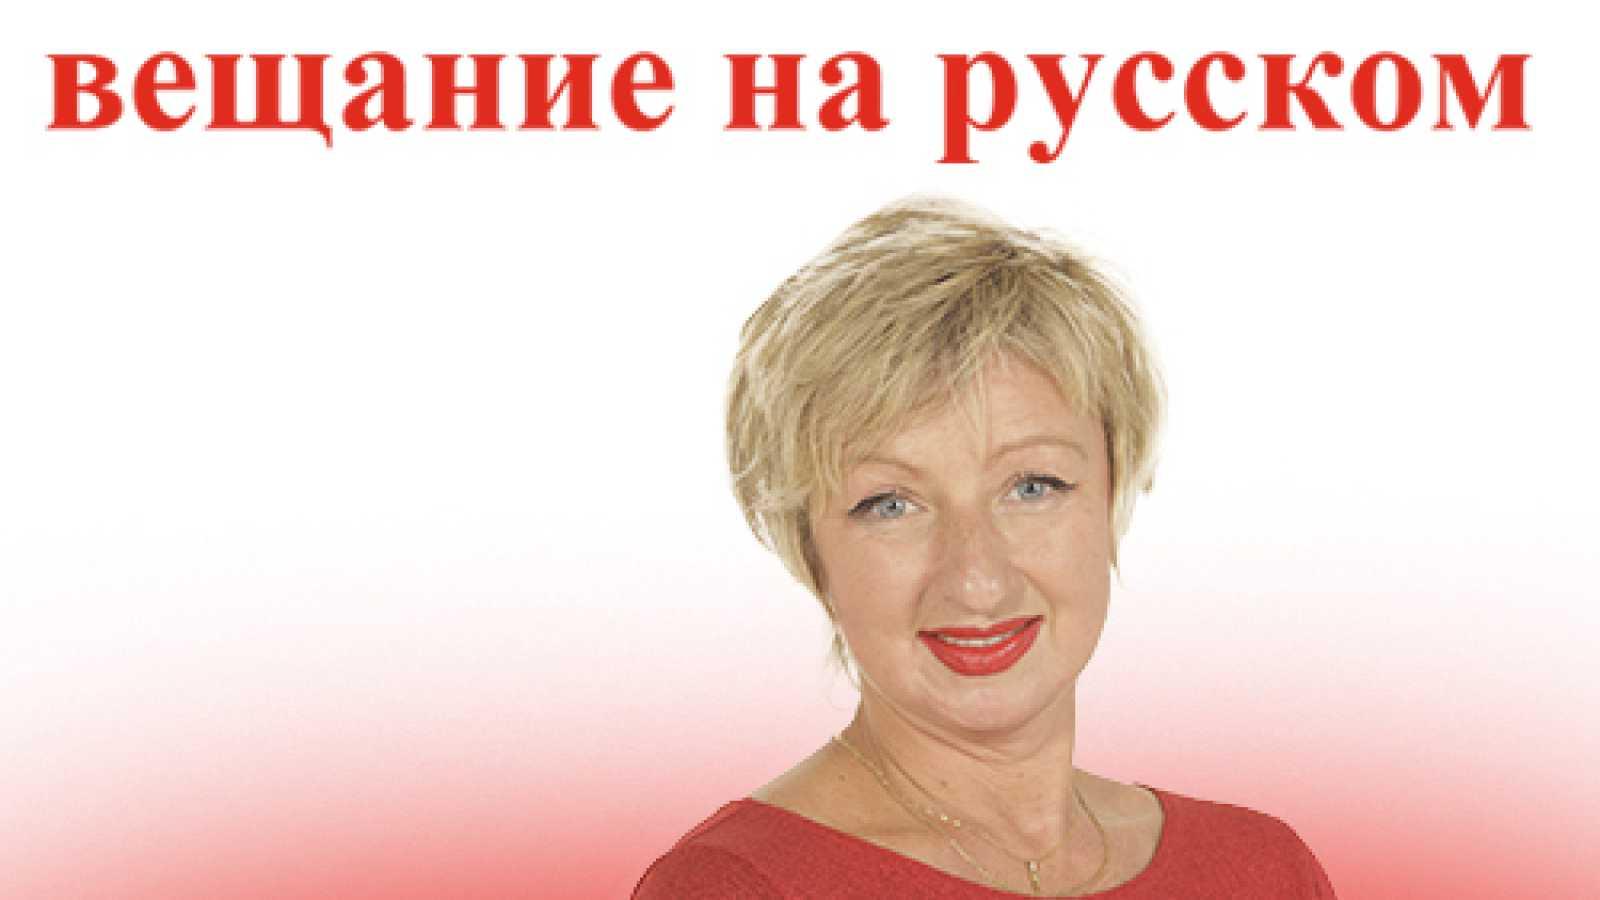 Emisión en ruso - Ispaniya perejodit na letneye vremia - 29/03/21 - Escuchar ahora